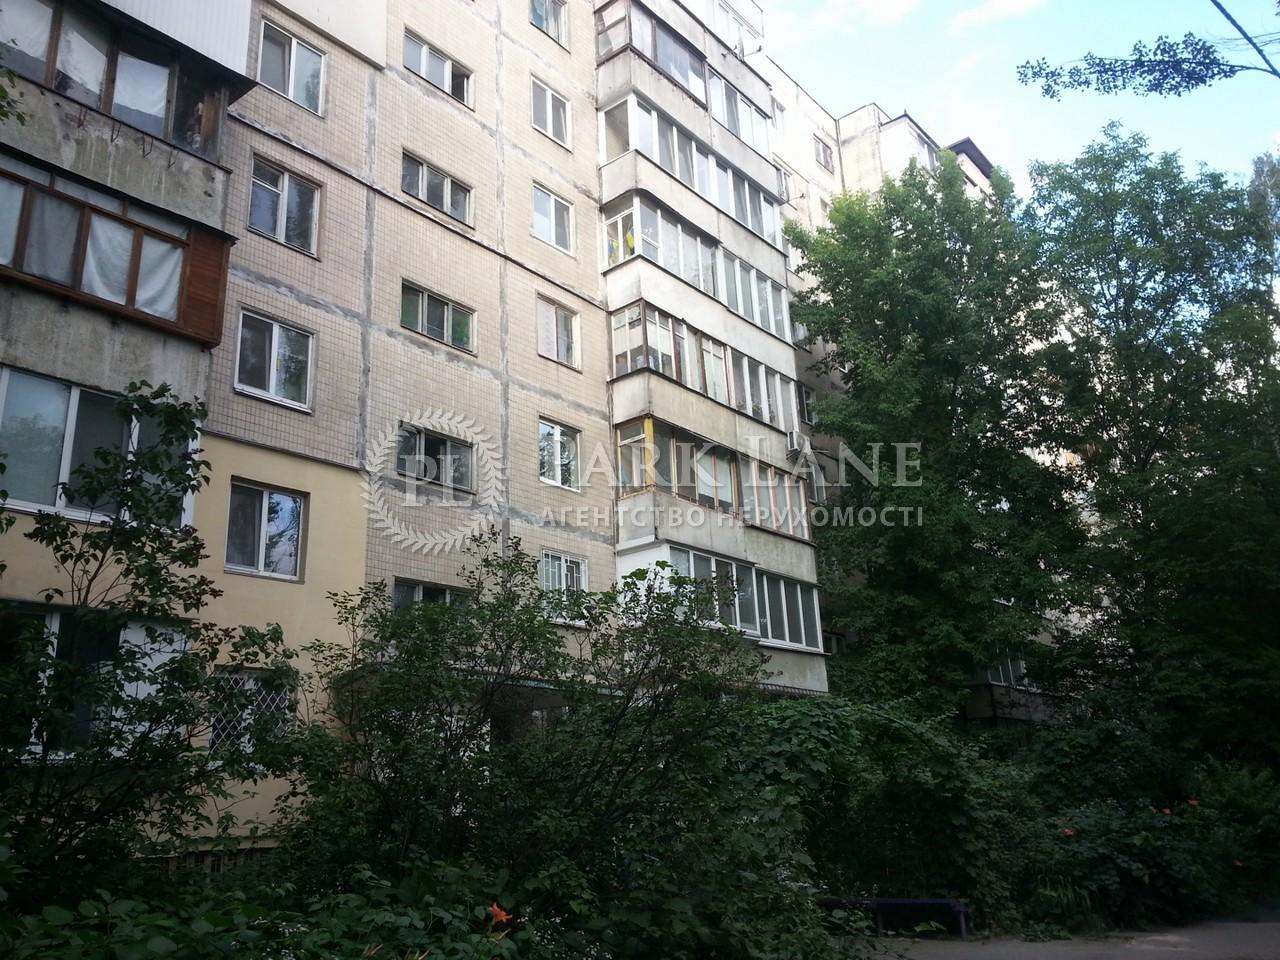 Квартира ул. Тулузы, 16, Киев, X-9034 - Фото 1